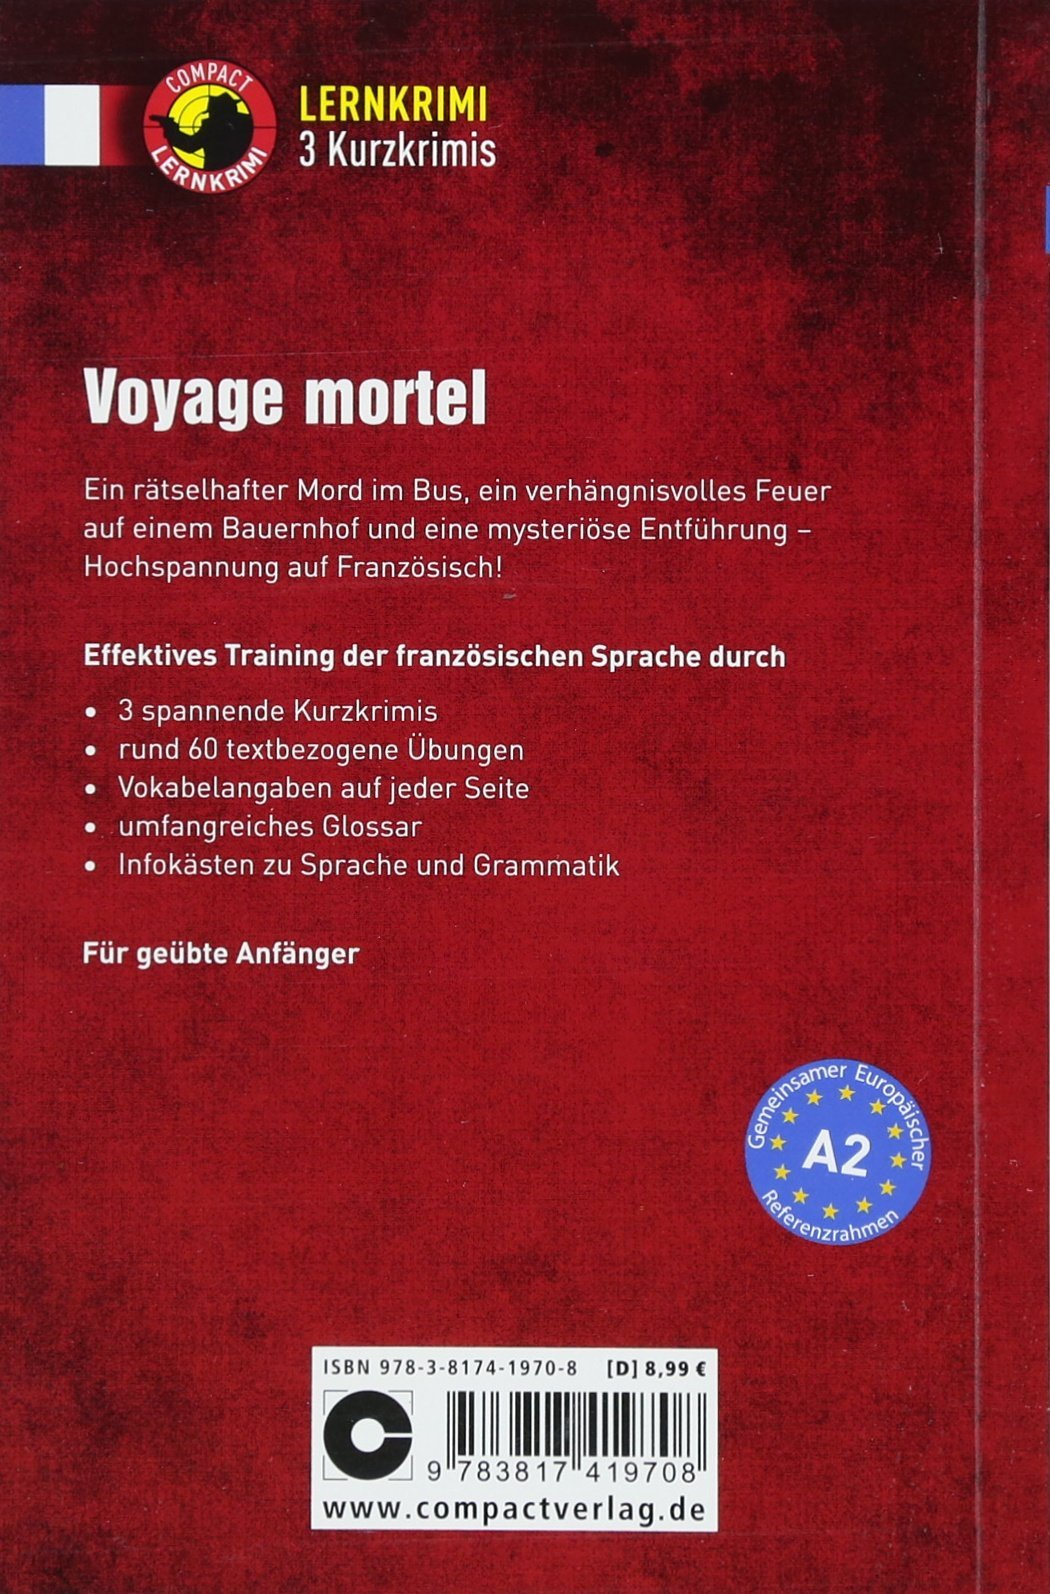 Voyage Mortel Fanzösisch A2 Lernkrimi Kurzkrimis Amazonde Marc